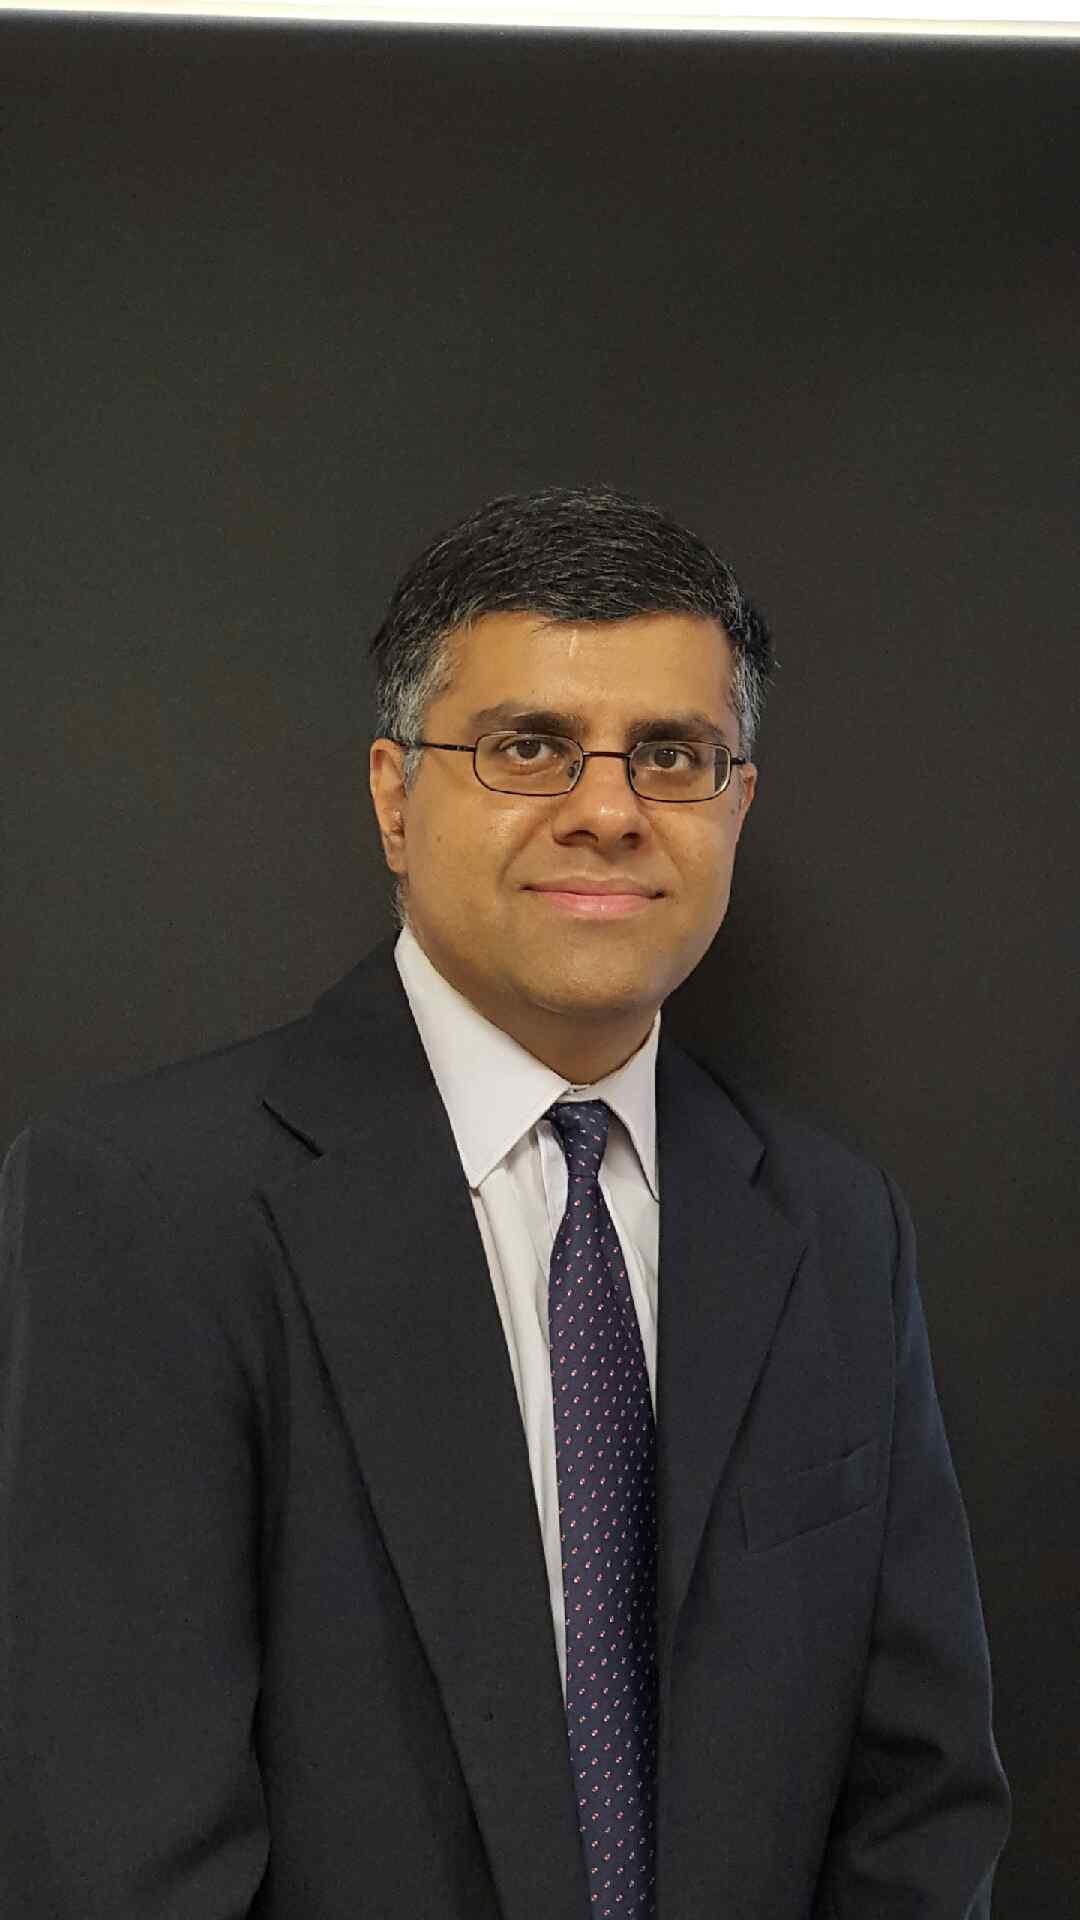 Dr. Arvind Vasudevan